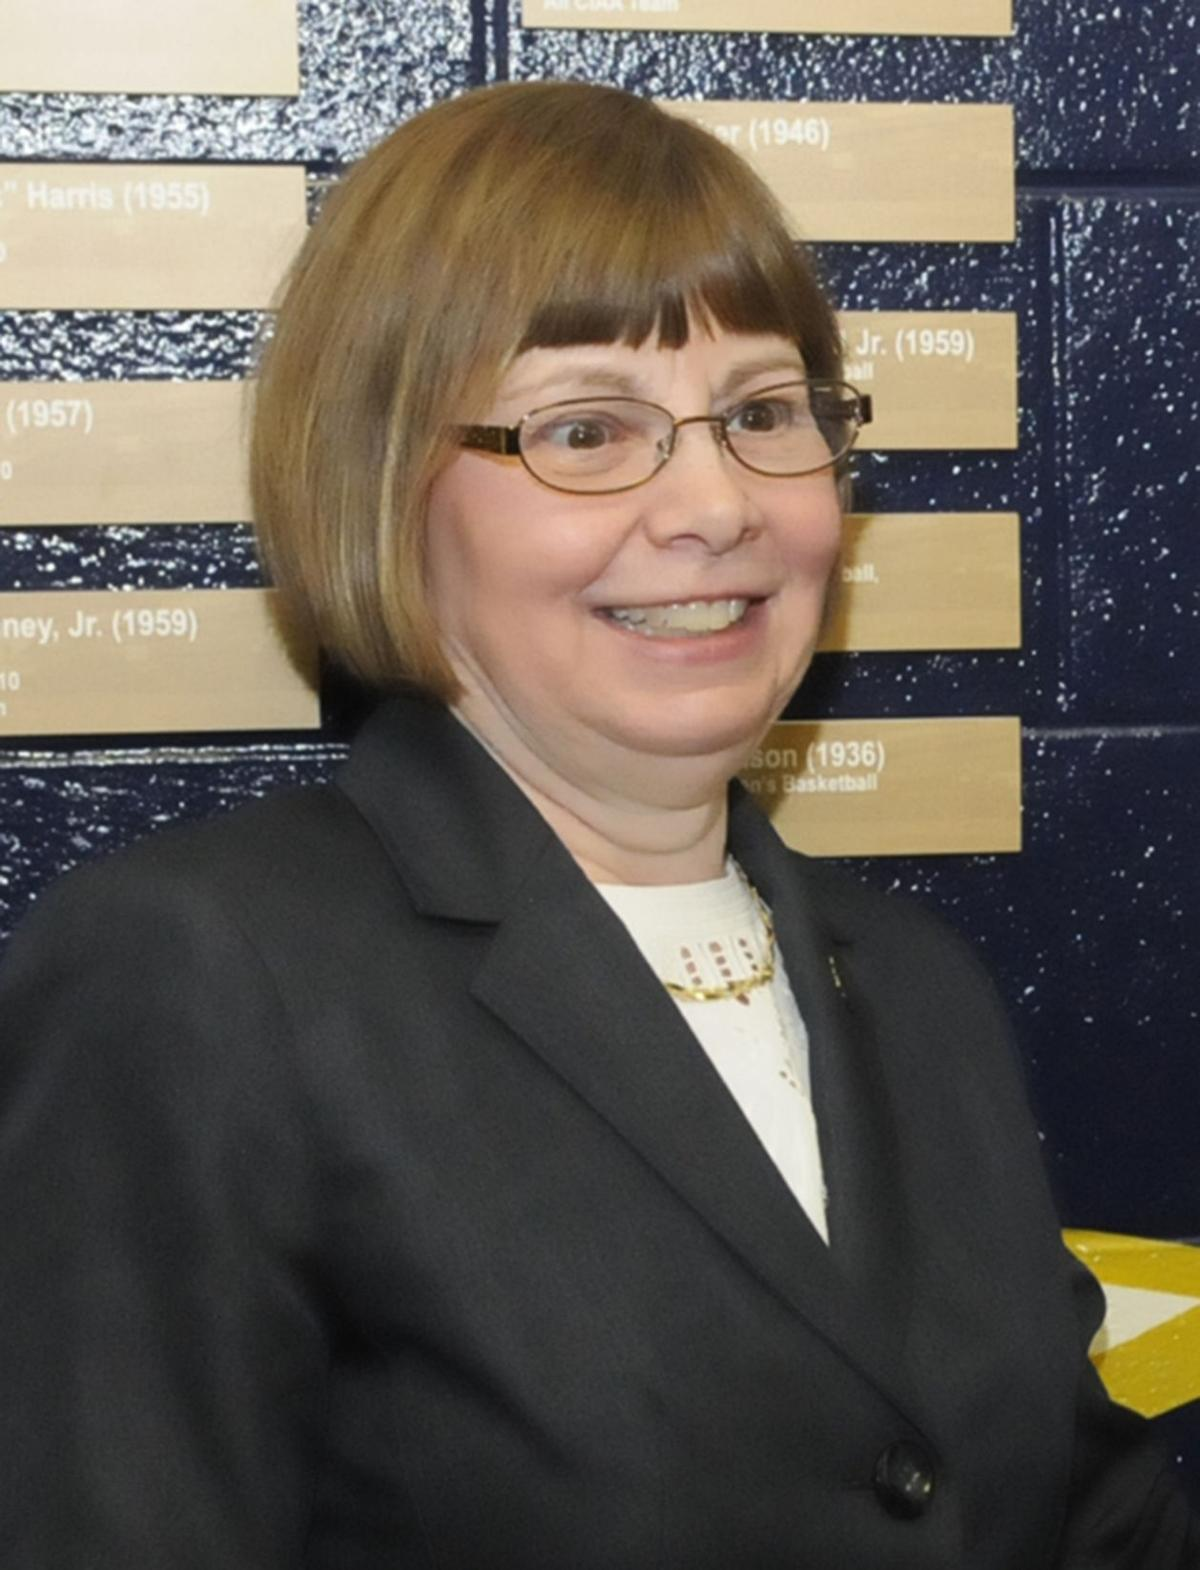 Bluefield State College President Dr. Marsha Krotseng